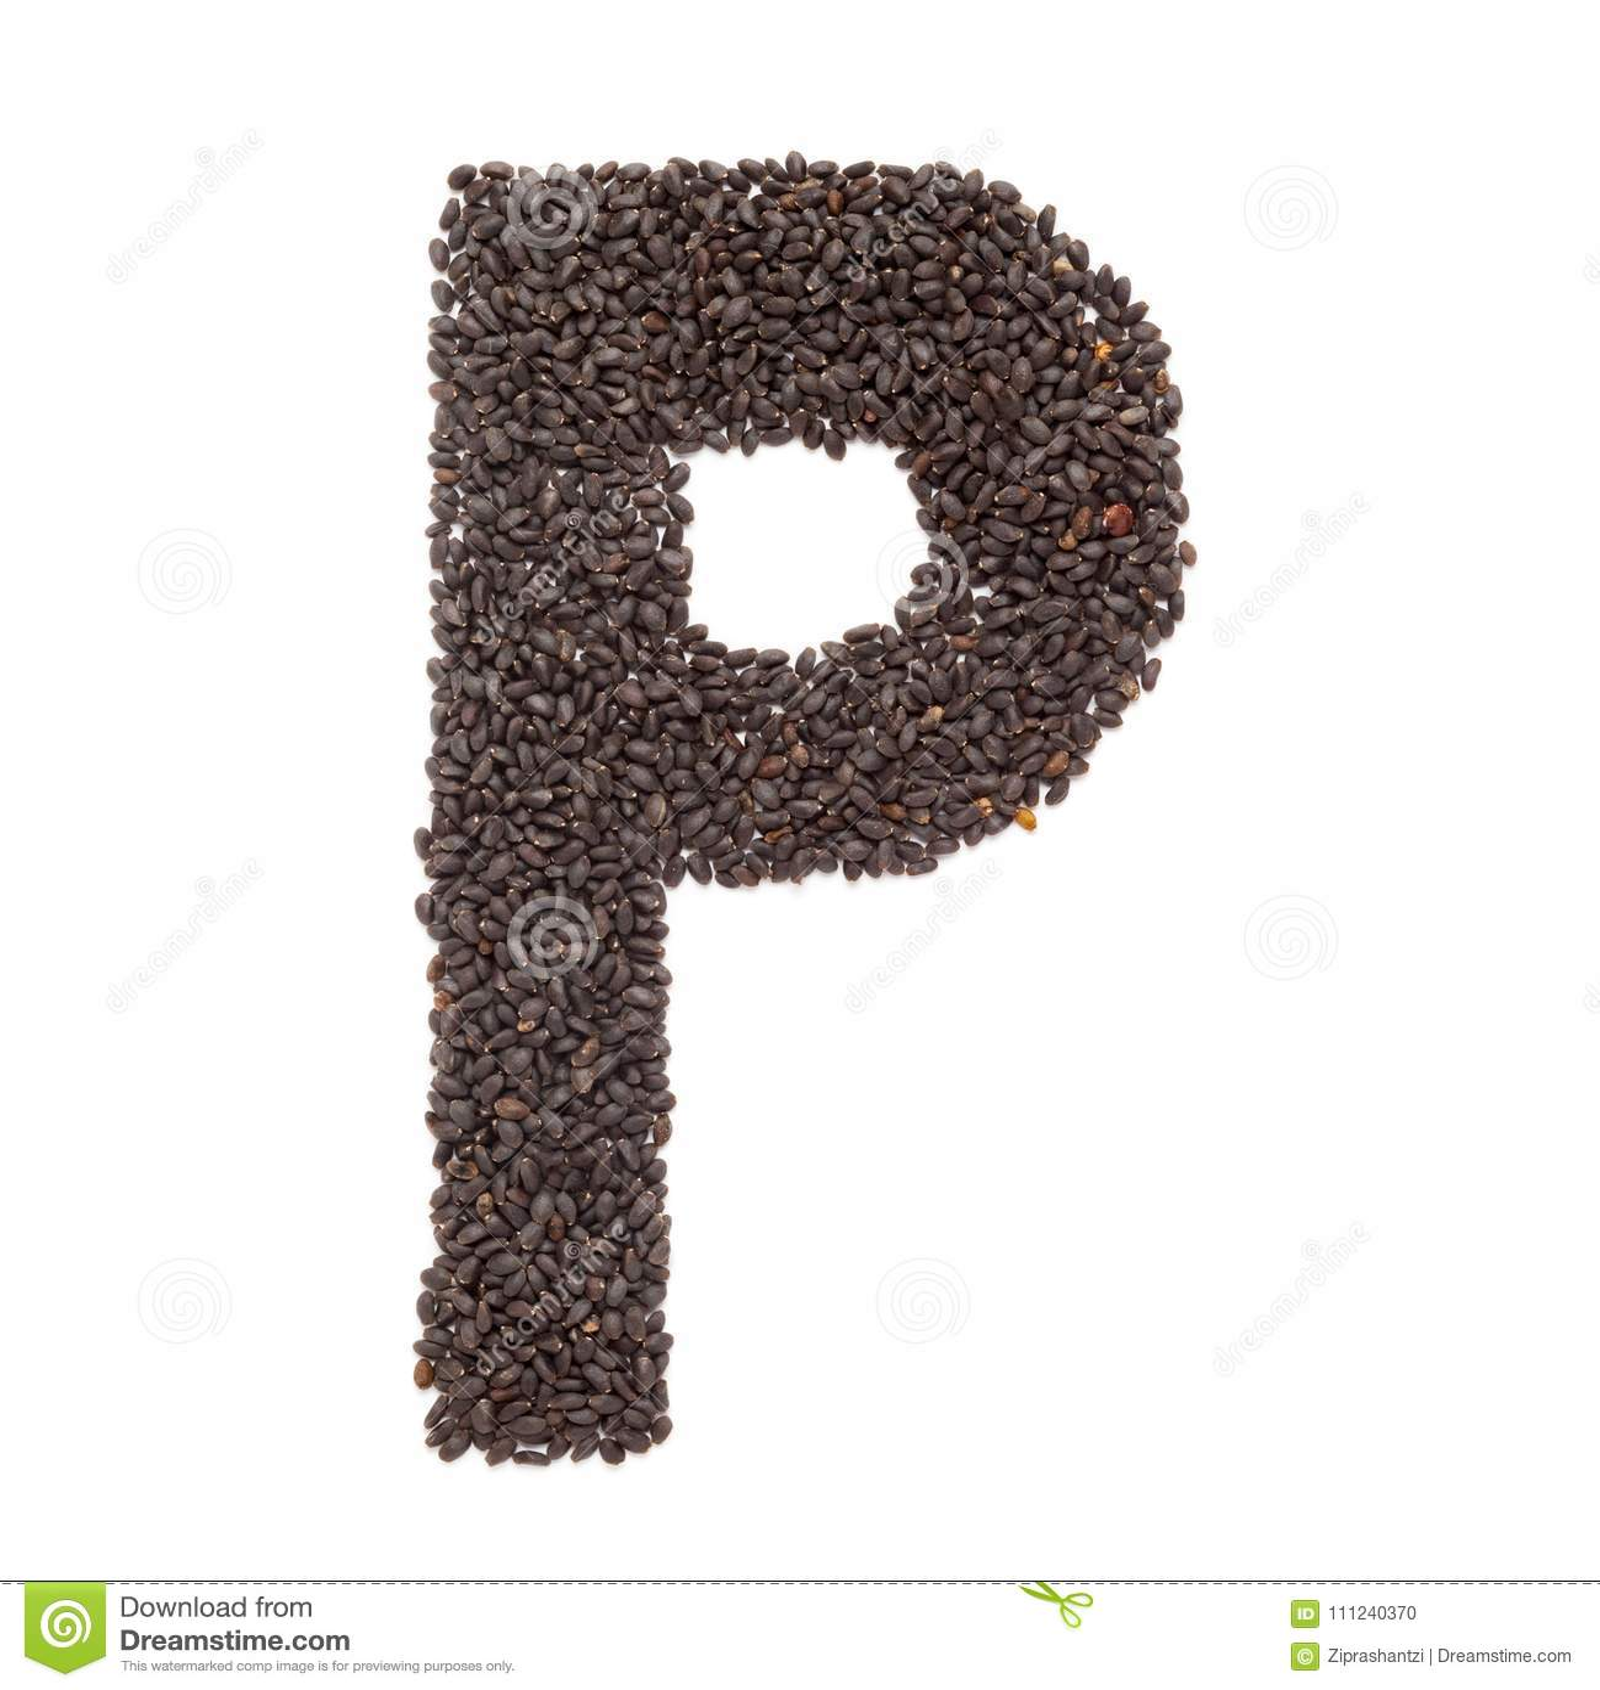 Organic Holy Basil Seed Ocimum Tenuiflorum Or Tulsi In P Shape For